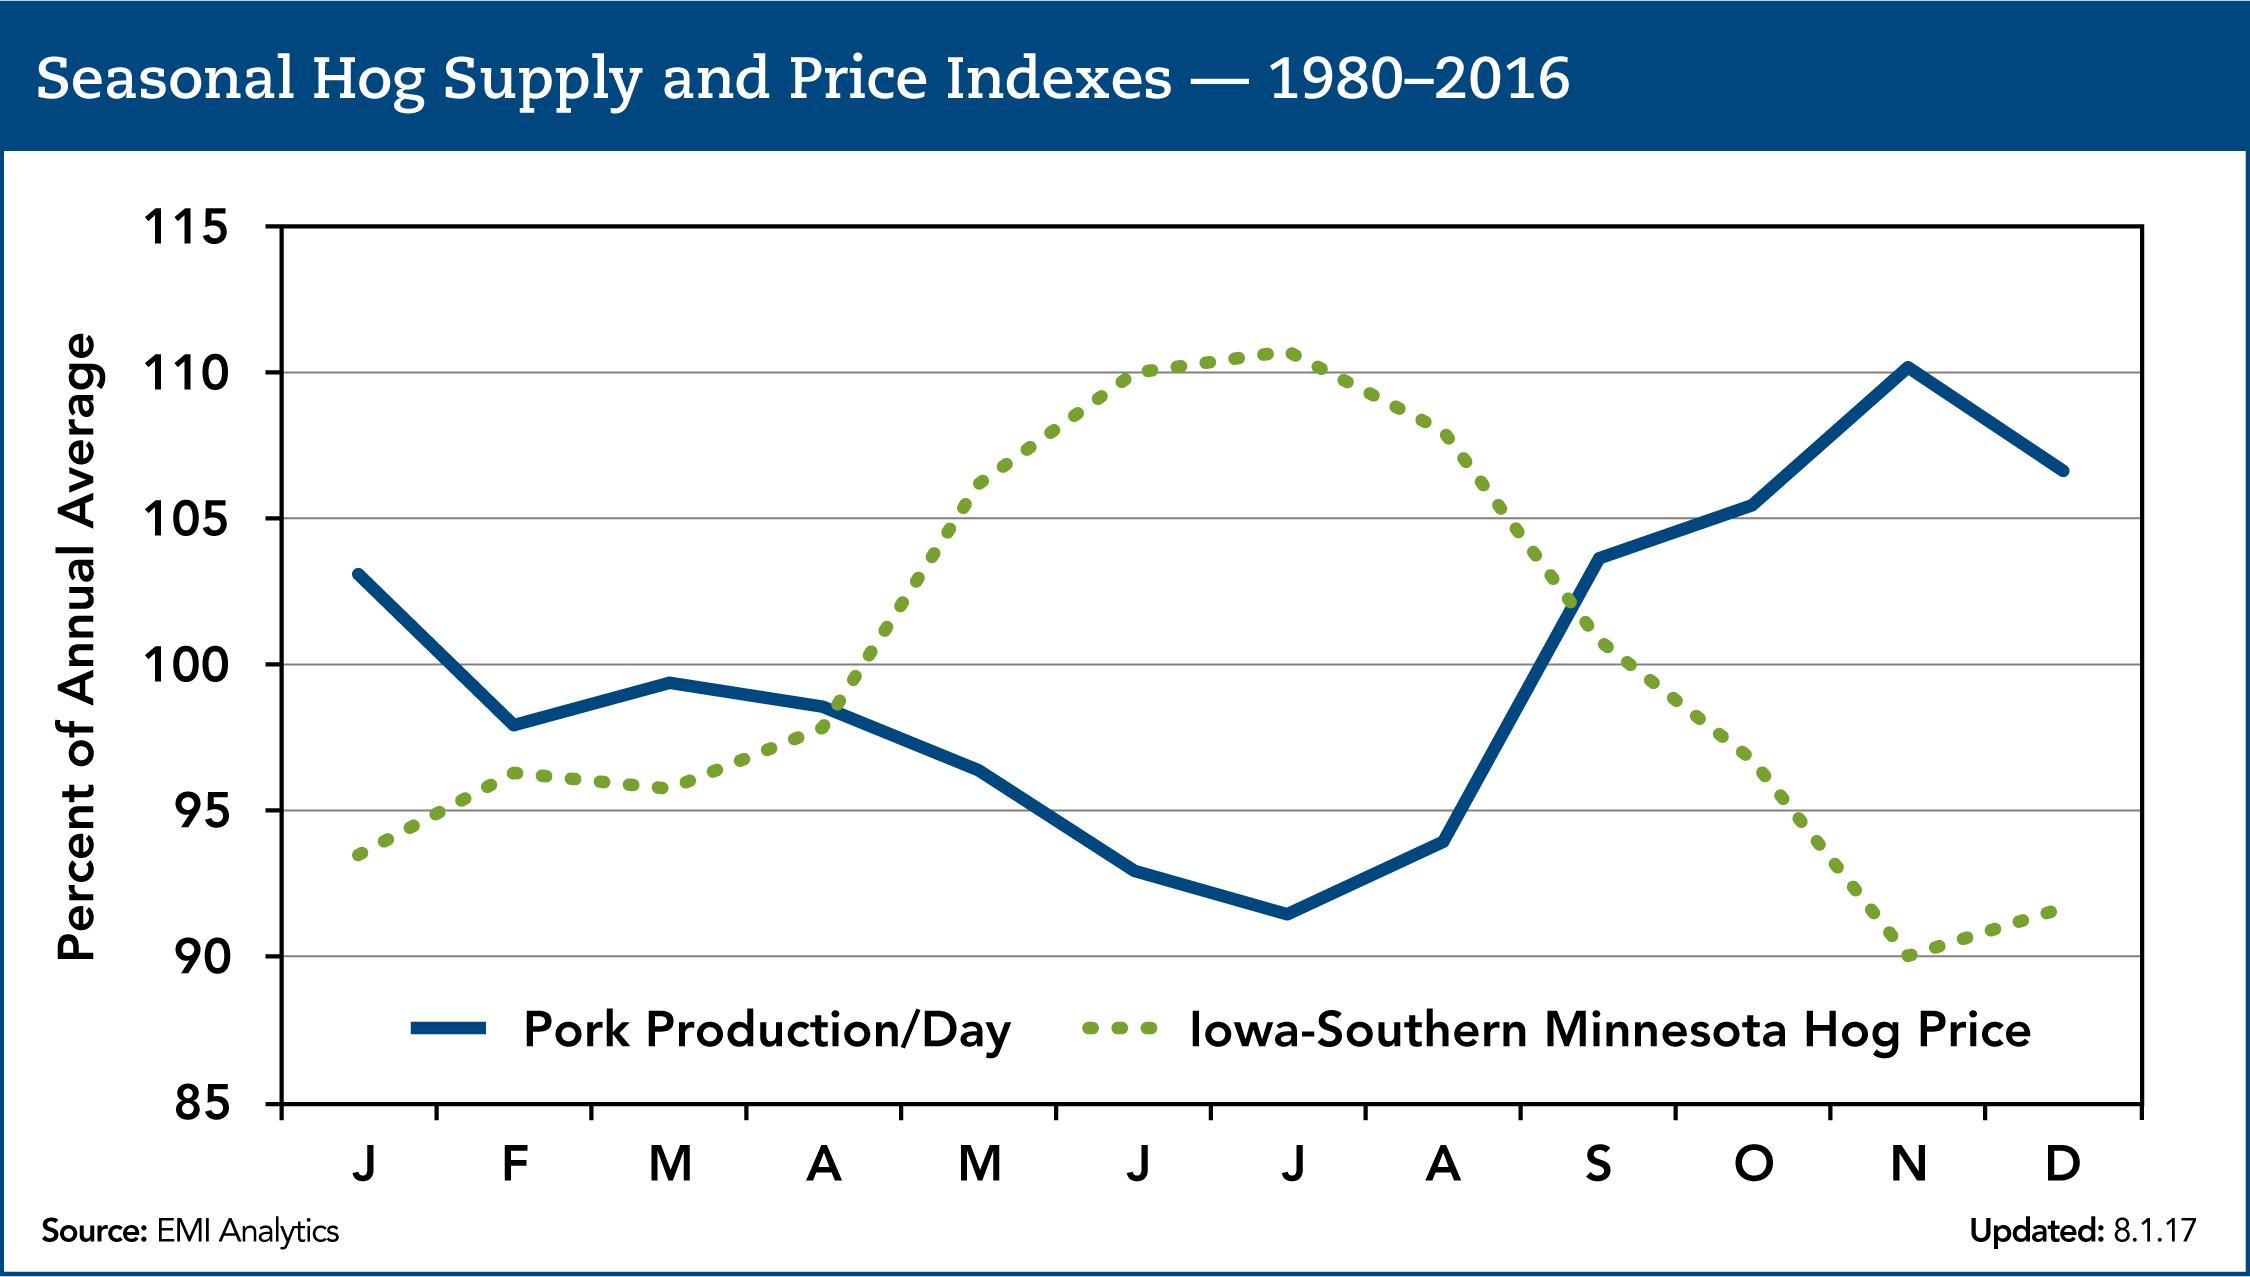 seasonal hog supply and price indexes 2016